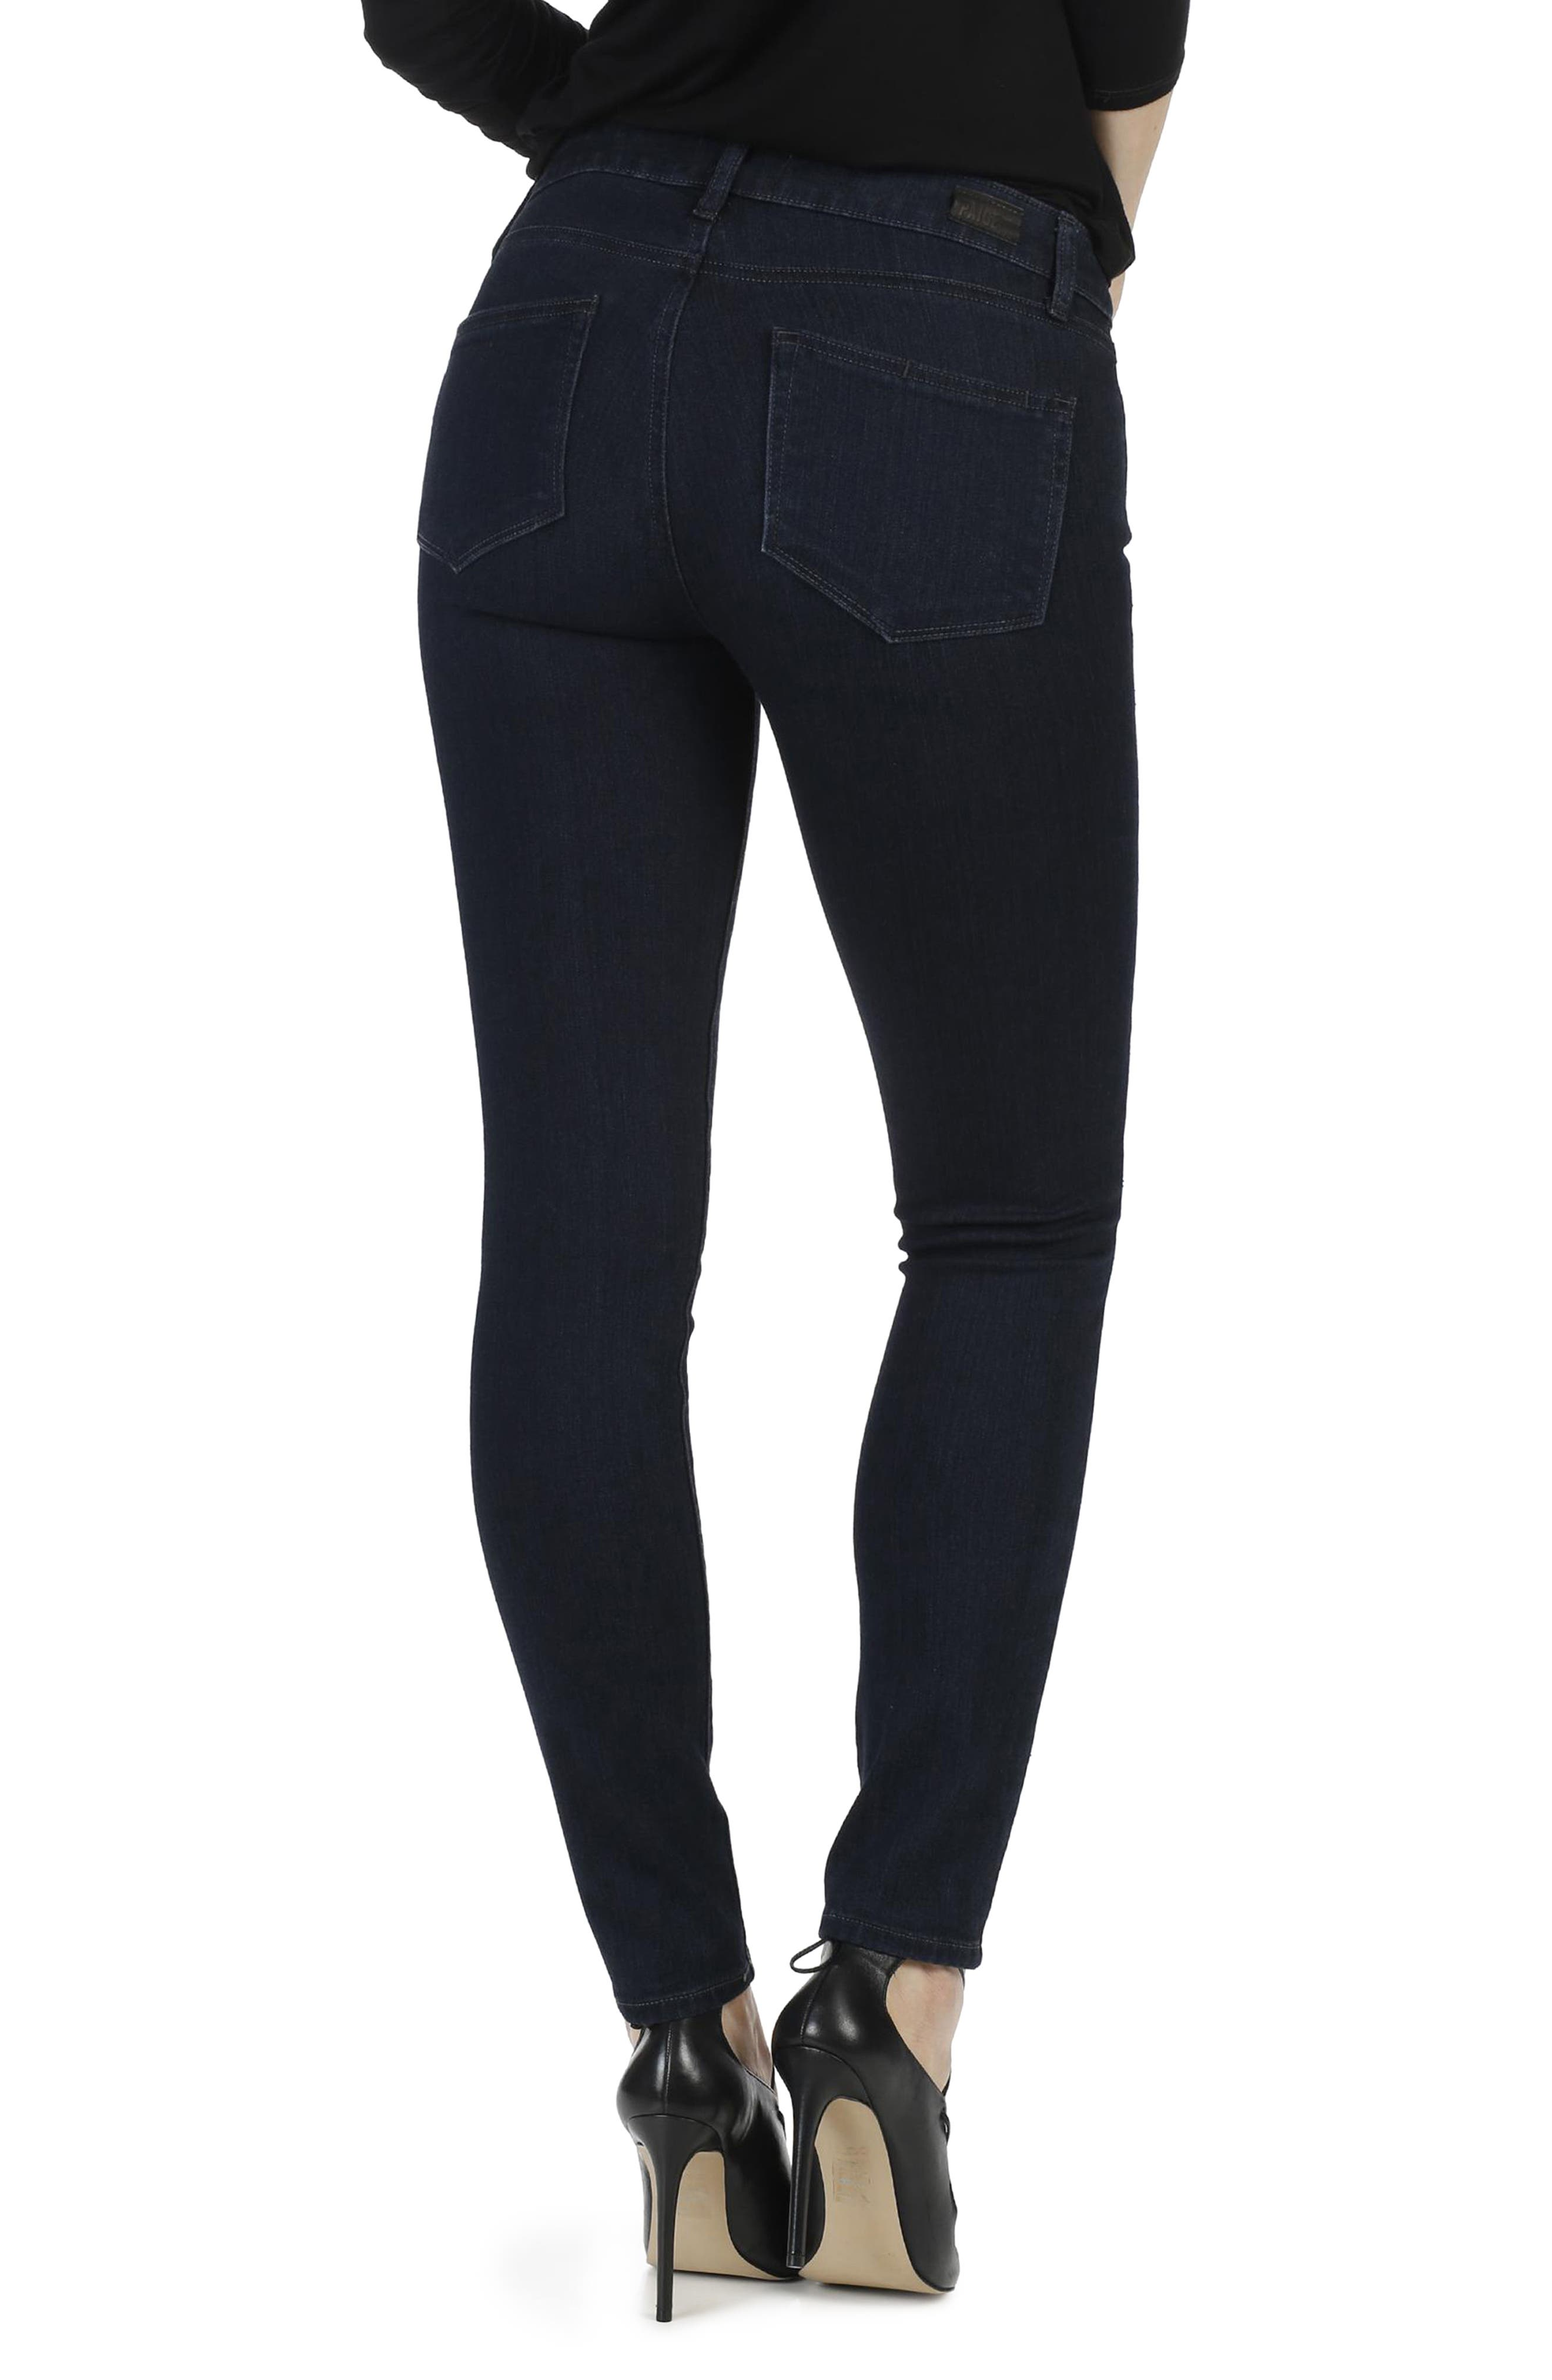 Transcend - Verdugo Ankle Ultra Skinny Jeans,                             Alternate thumbnail 3, color,                             Dalton